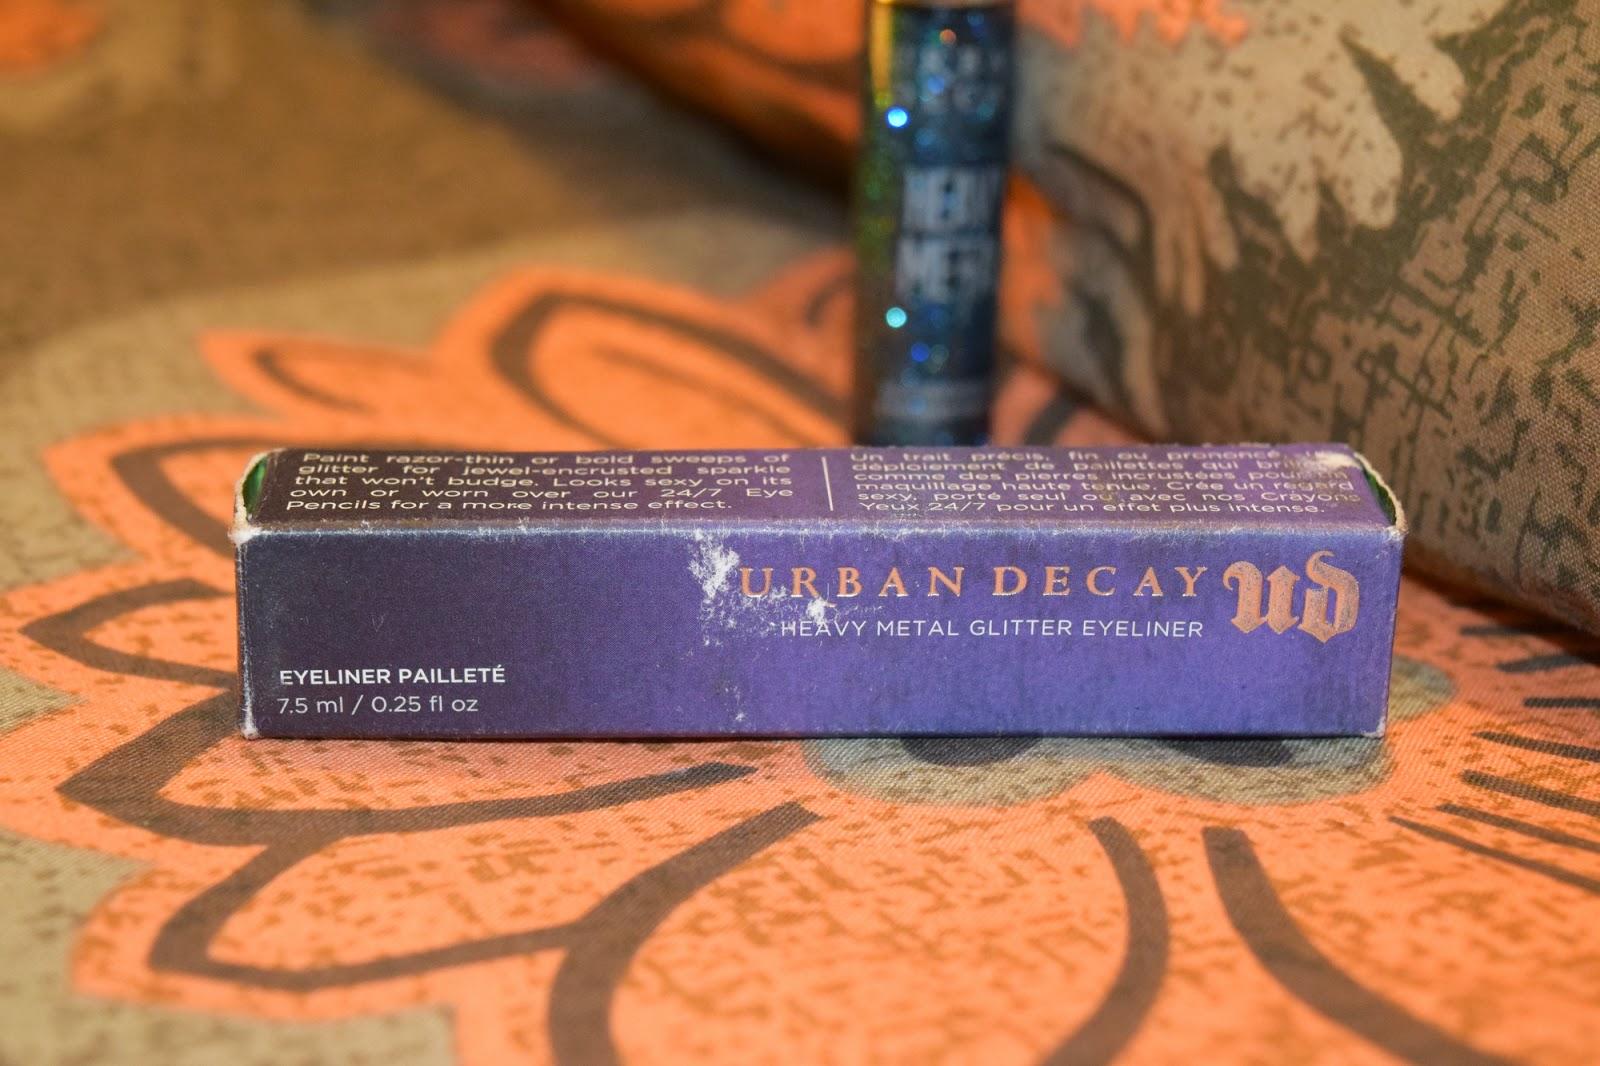 Heavy Metal Glitter Eyeliner in Spandex by Urban Decay